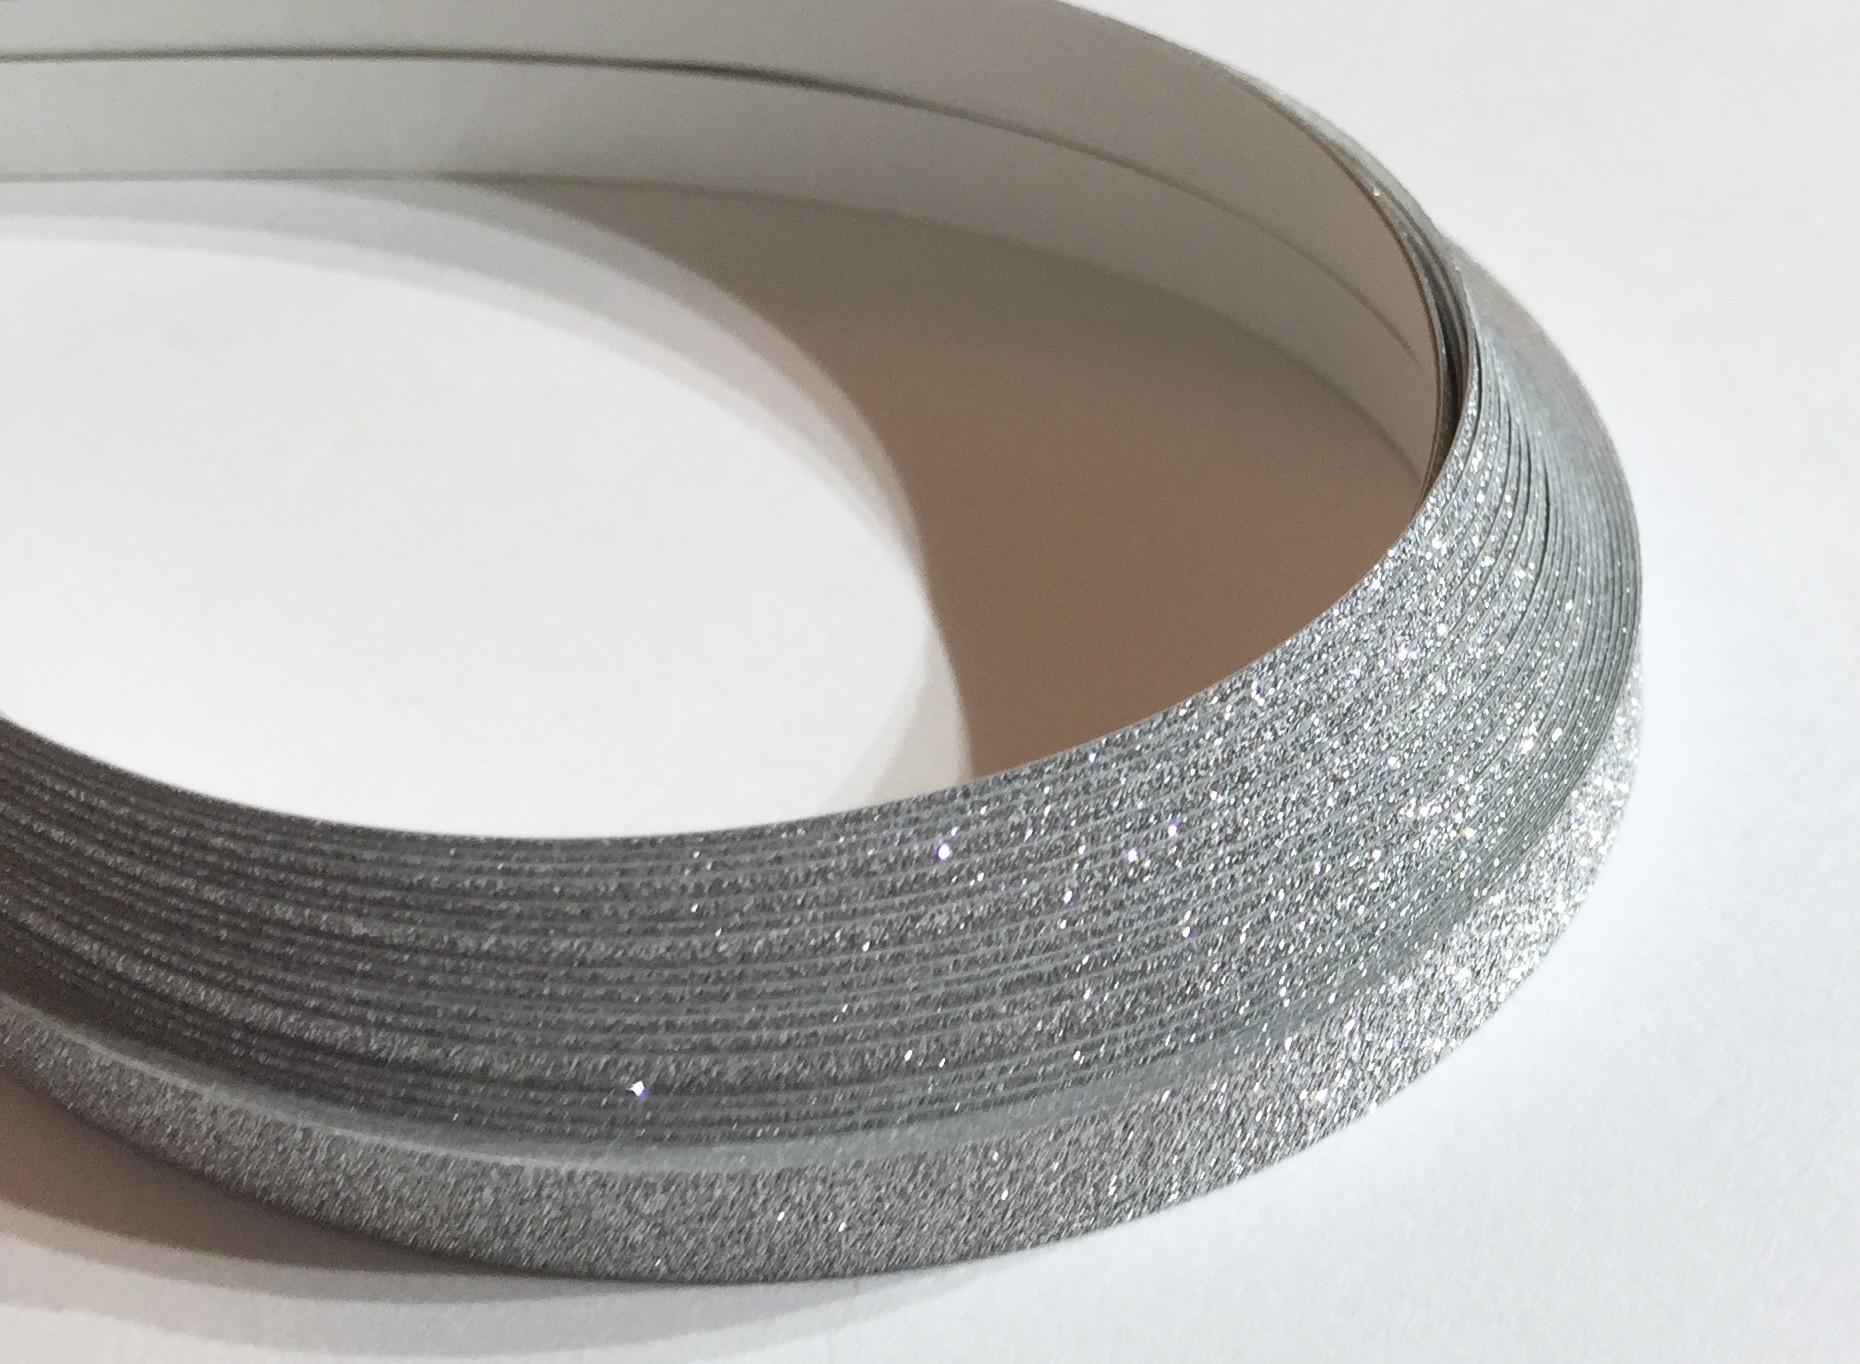 Image of glitter paper